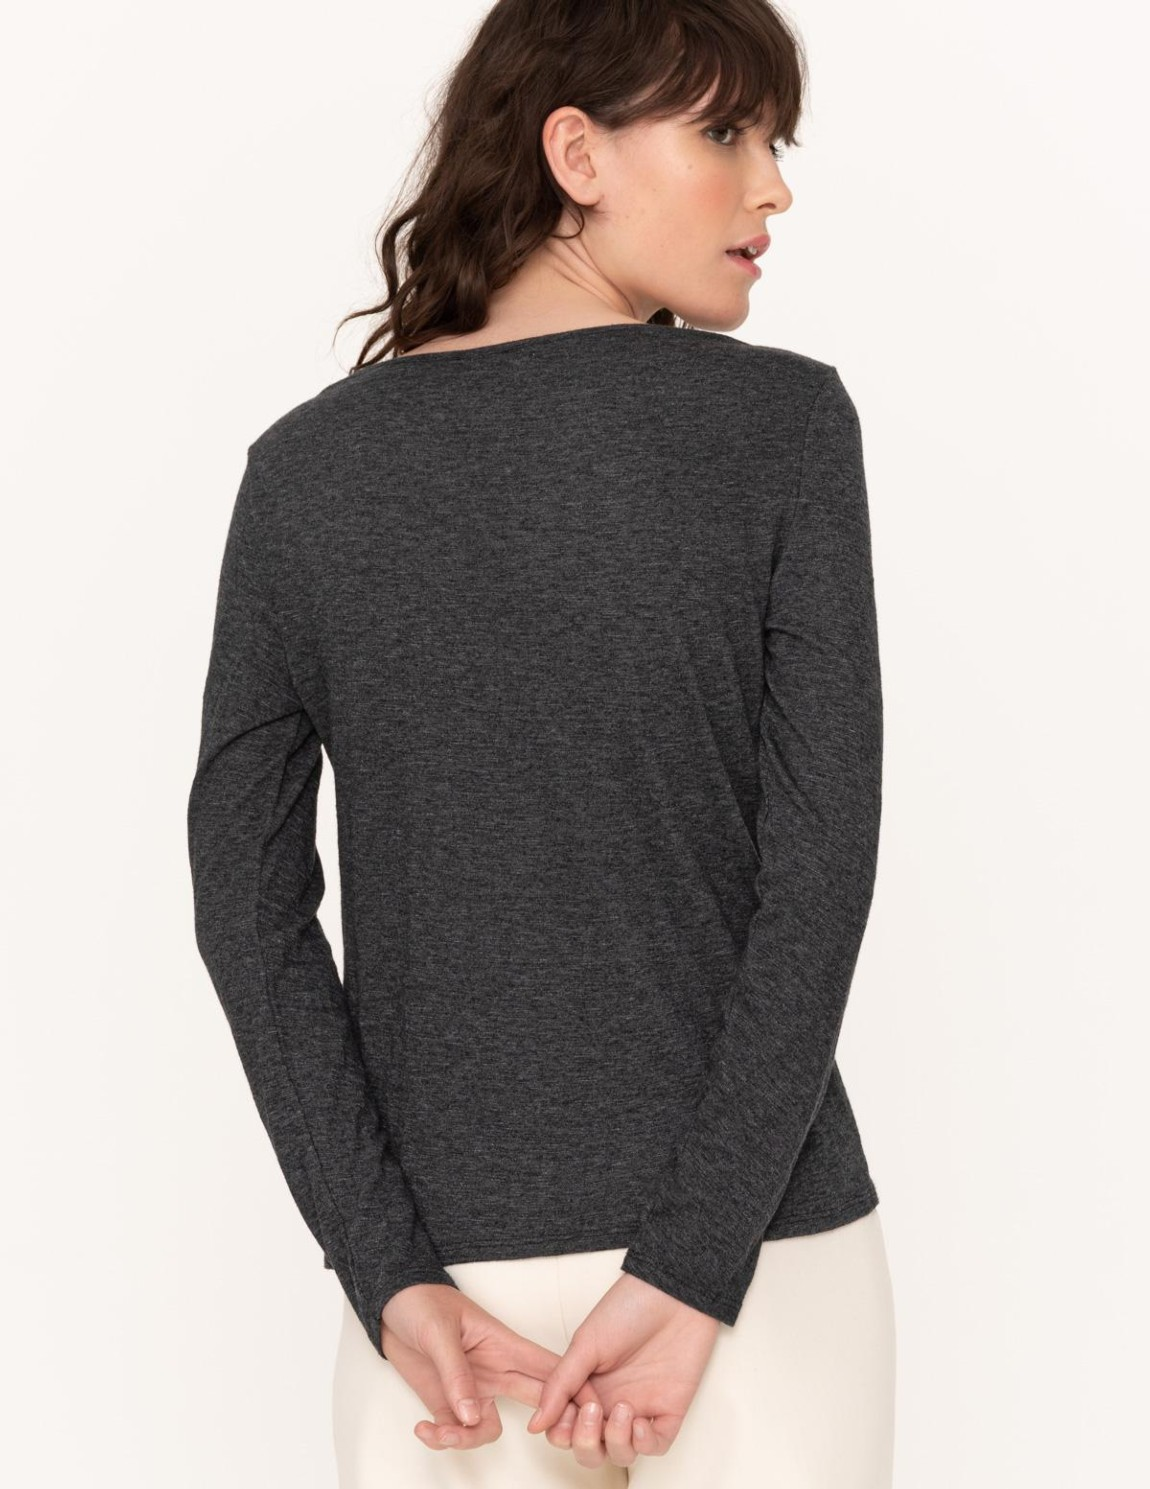 Camiseta cuello redondo - Ítem2